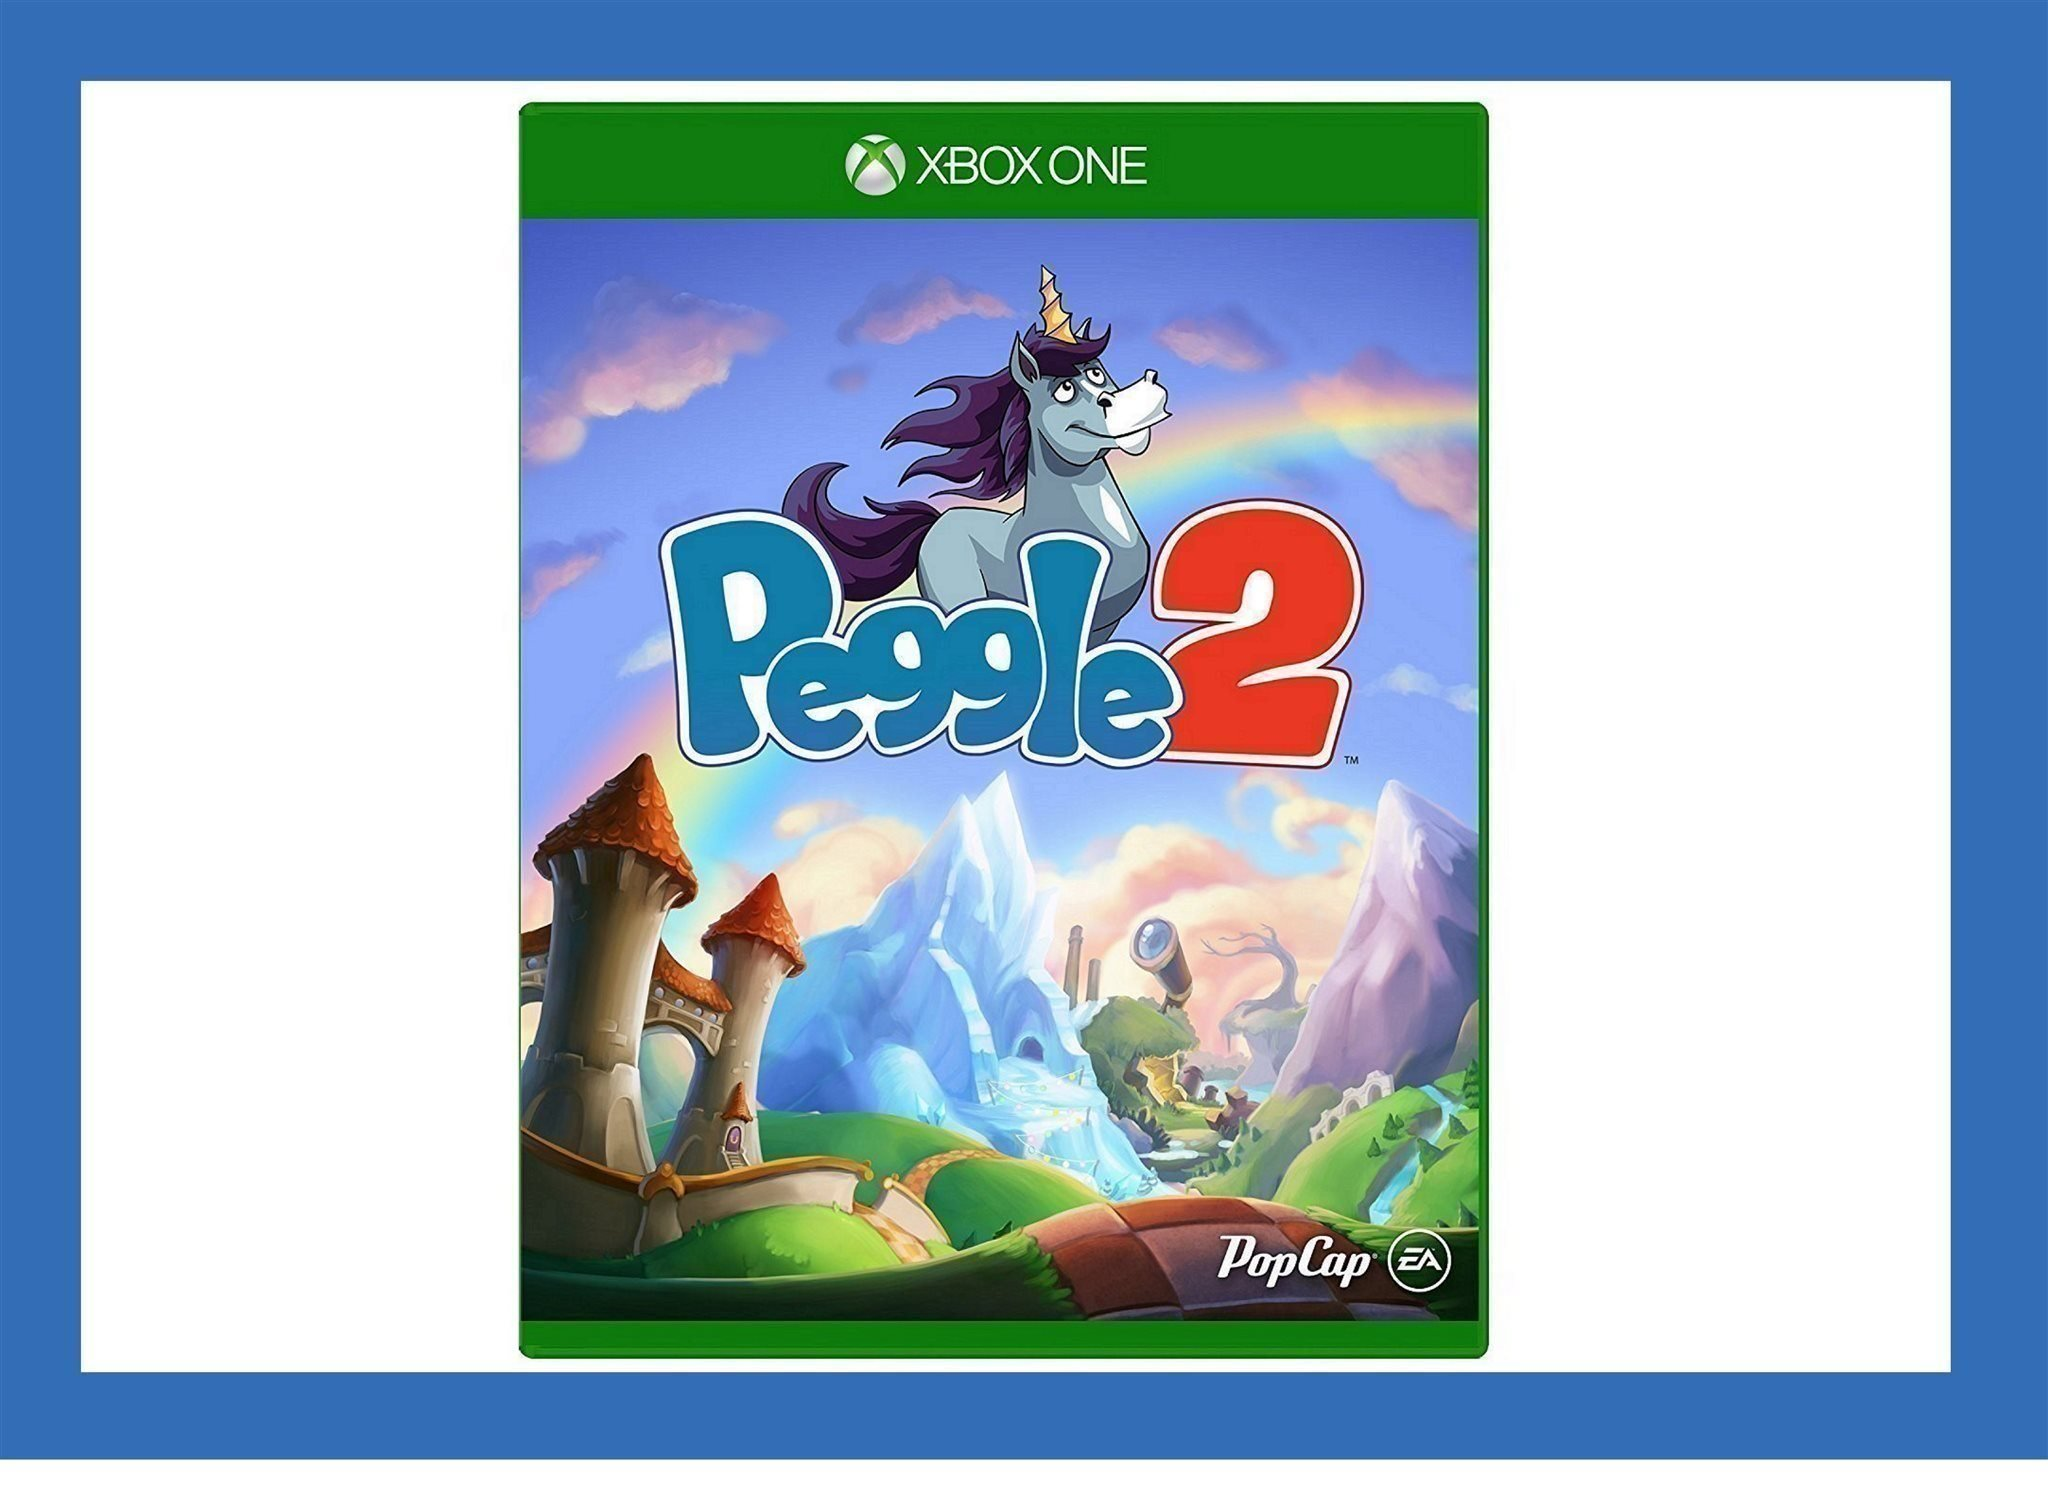 cc5a6d12548 Peggle 2 - XBOX ONE/XBOX 360 - XBOX LIVE (353542216) ᐈ Köp på Tradera